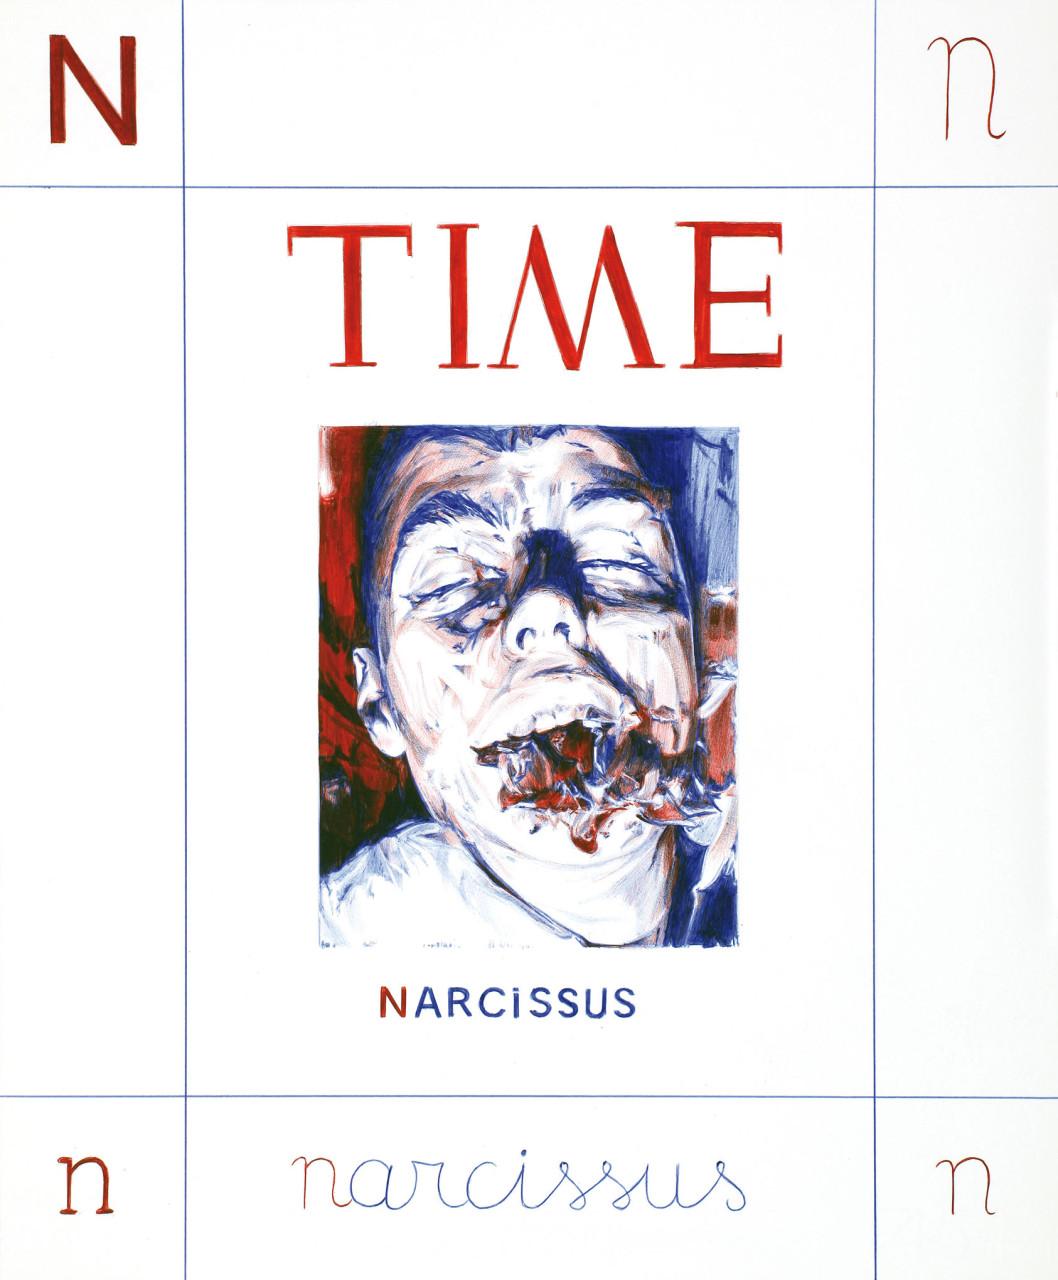 14N.narcissus_bassa